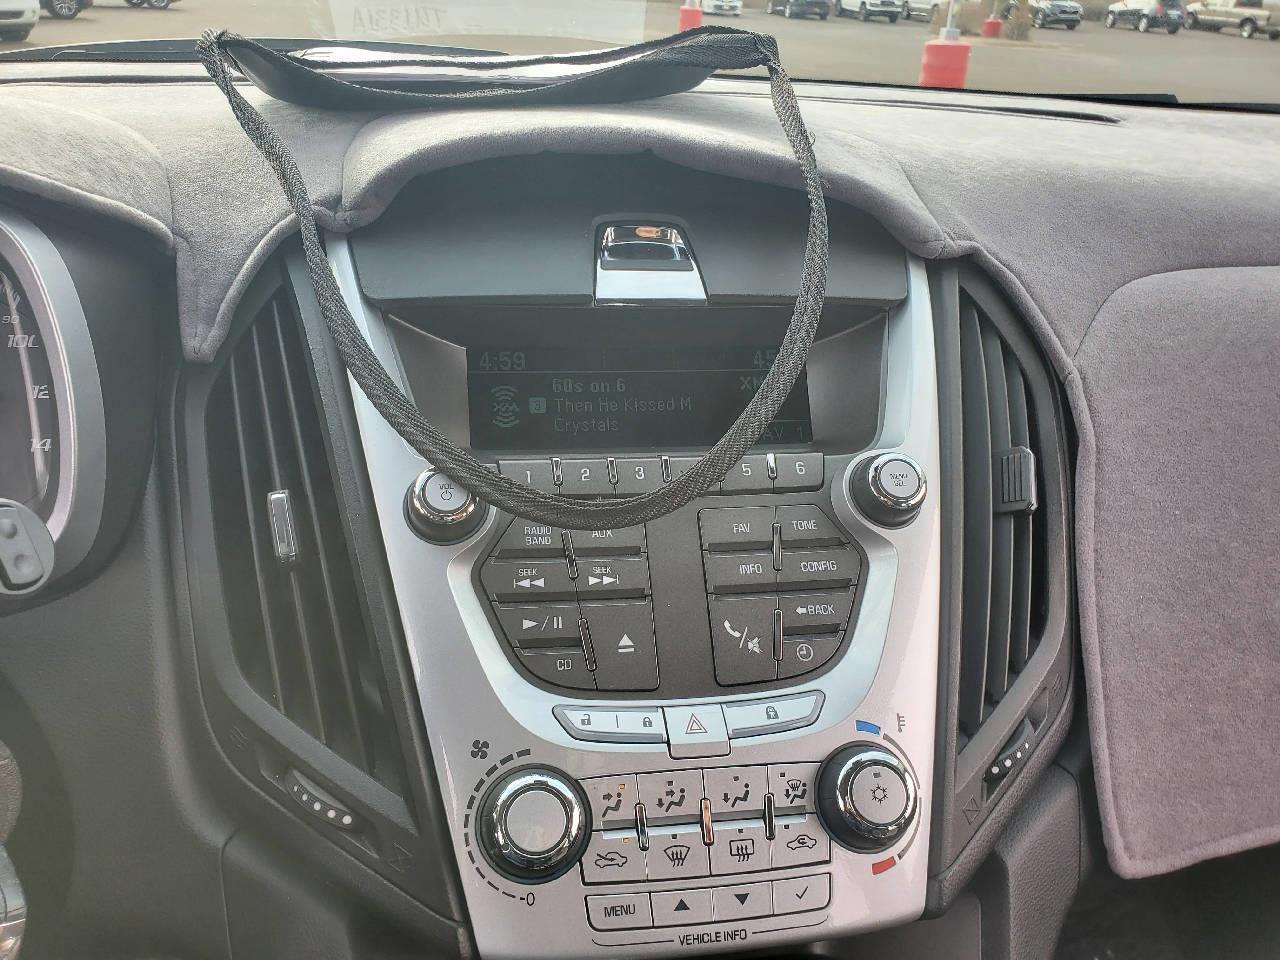 Pre-Owned 2010 Chevrolet Equinox LT w/1LT